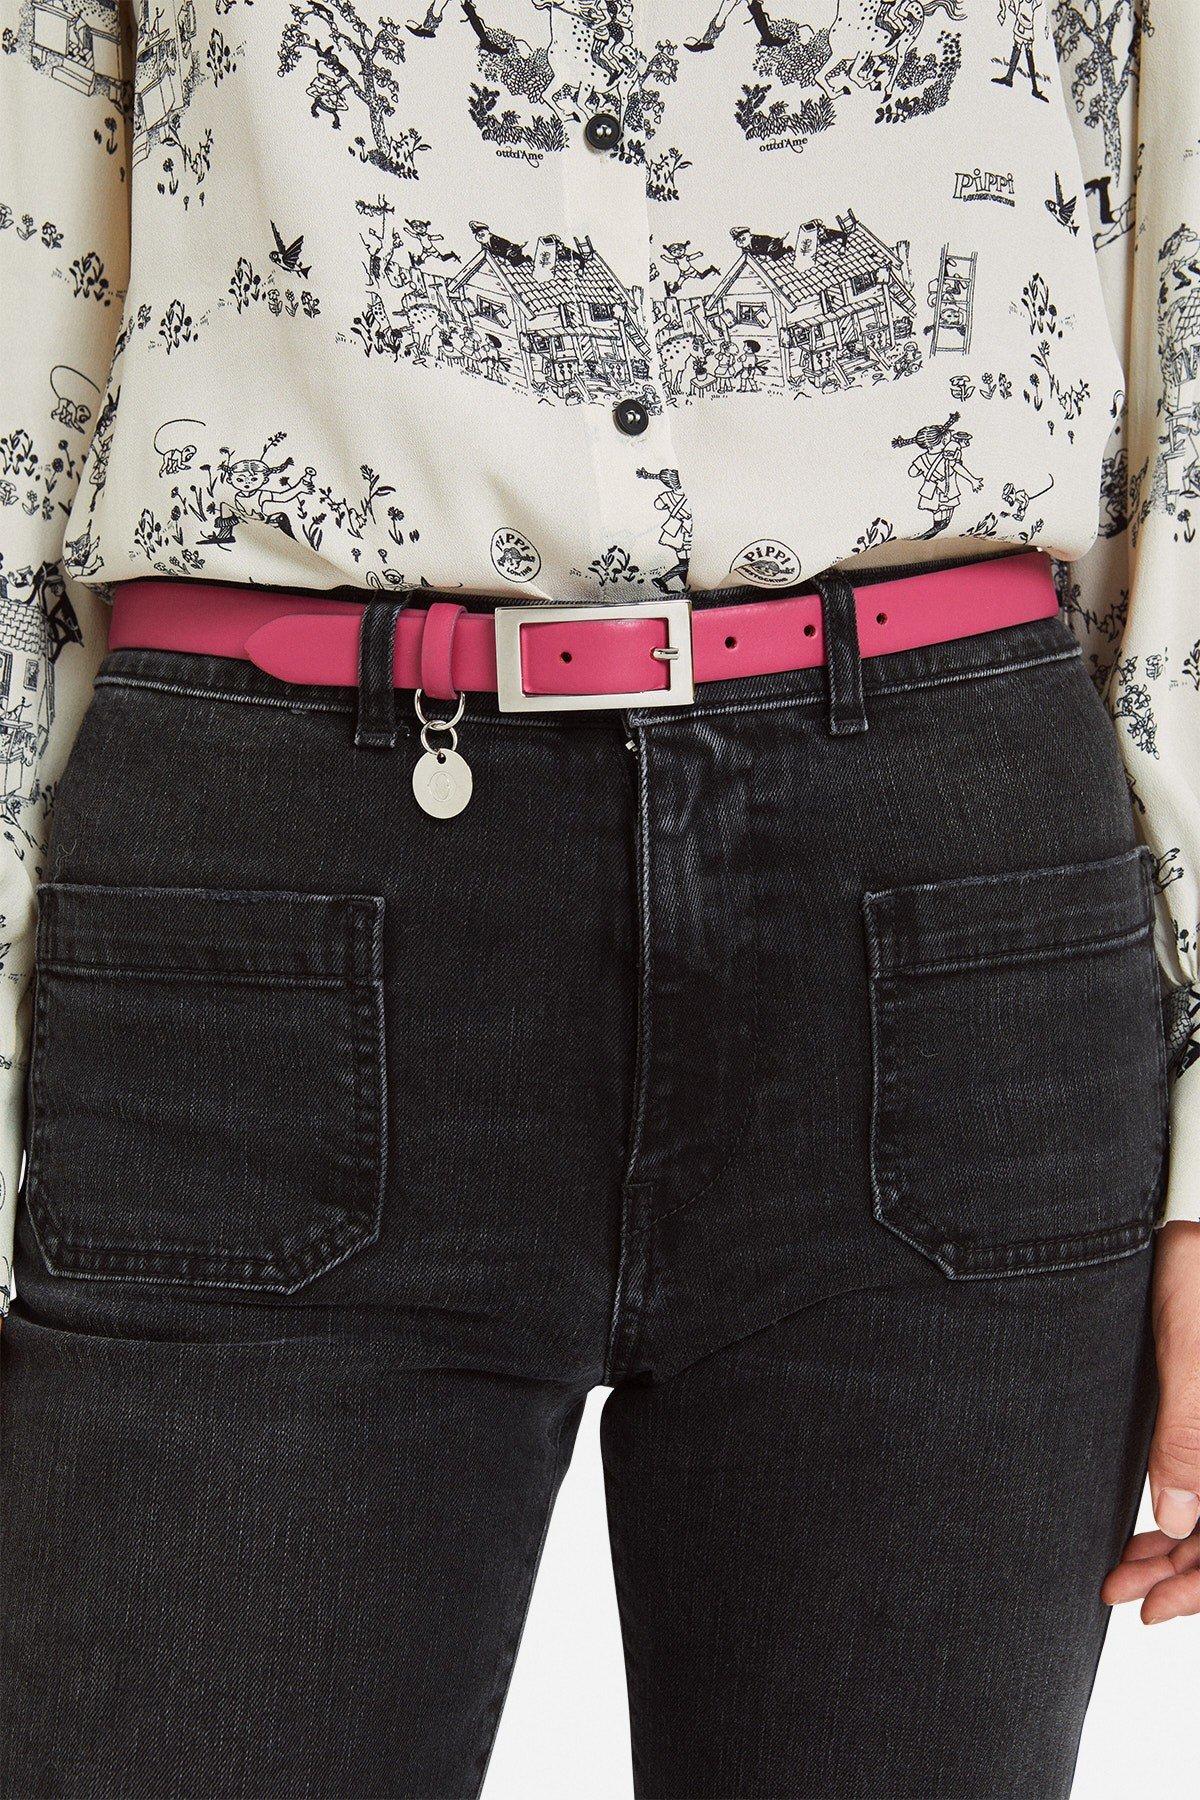 Thin leather belt